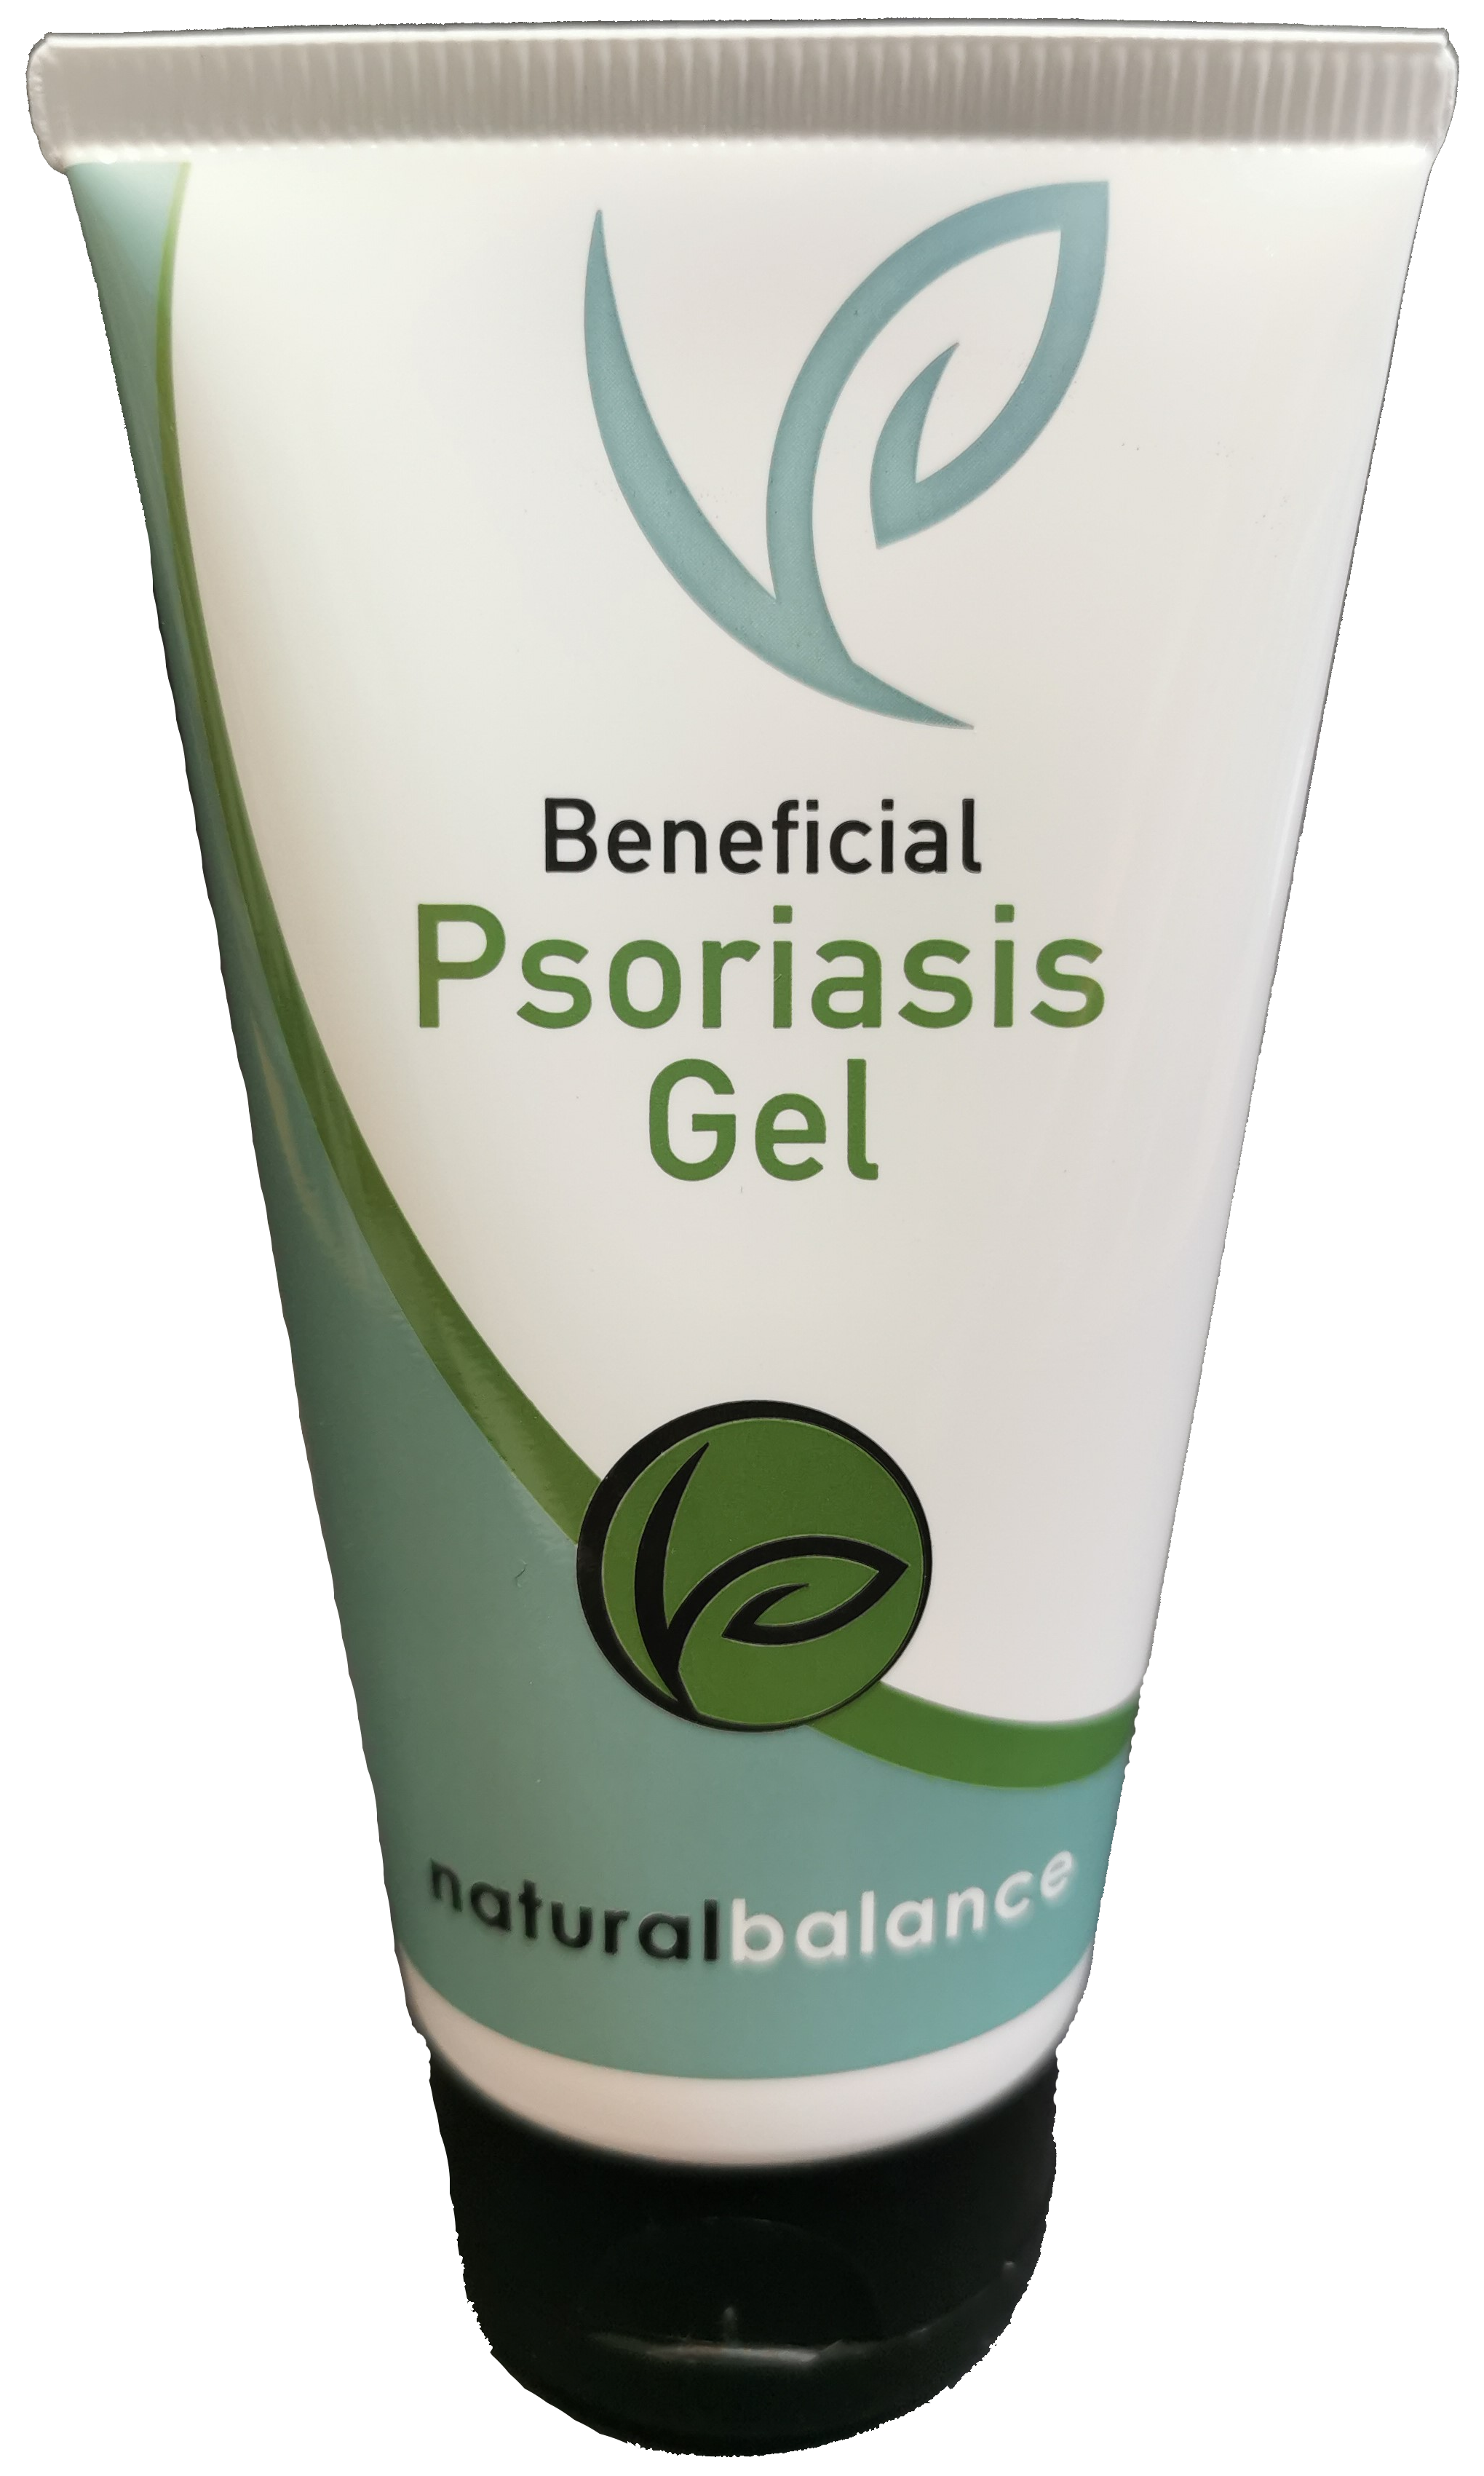 Psoriasis Gel